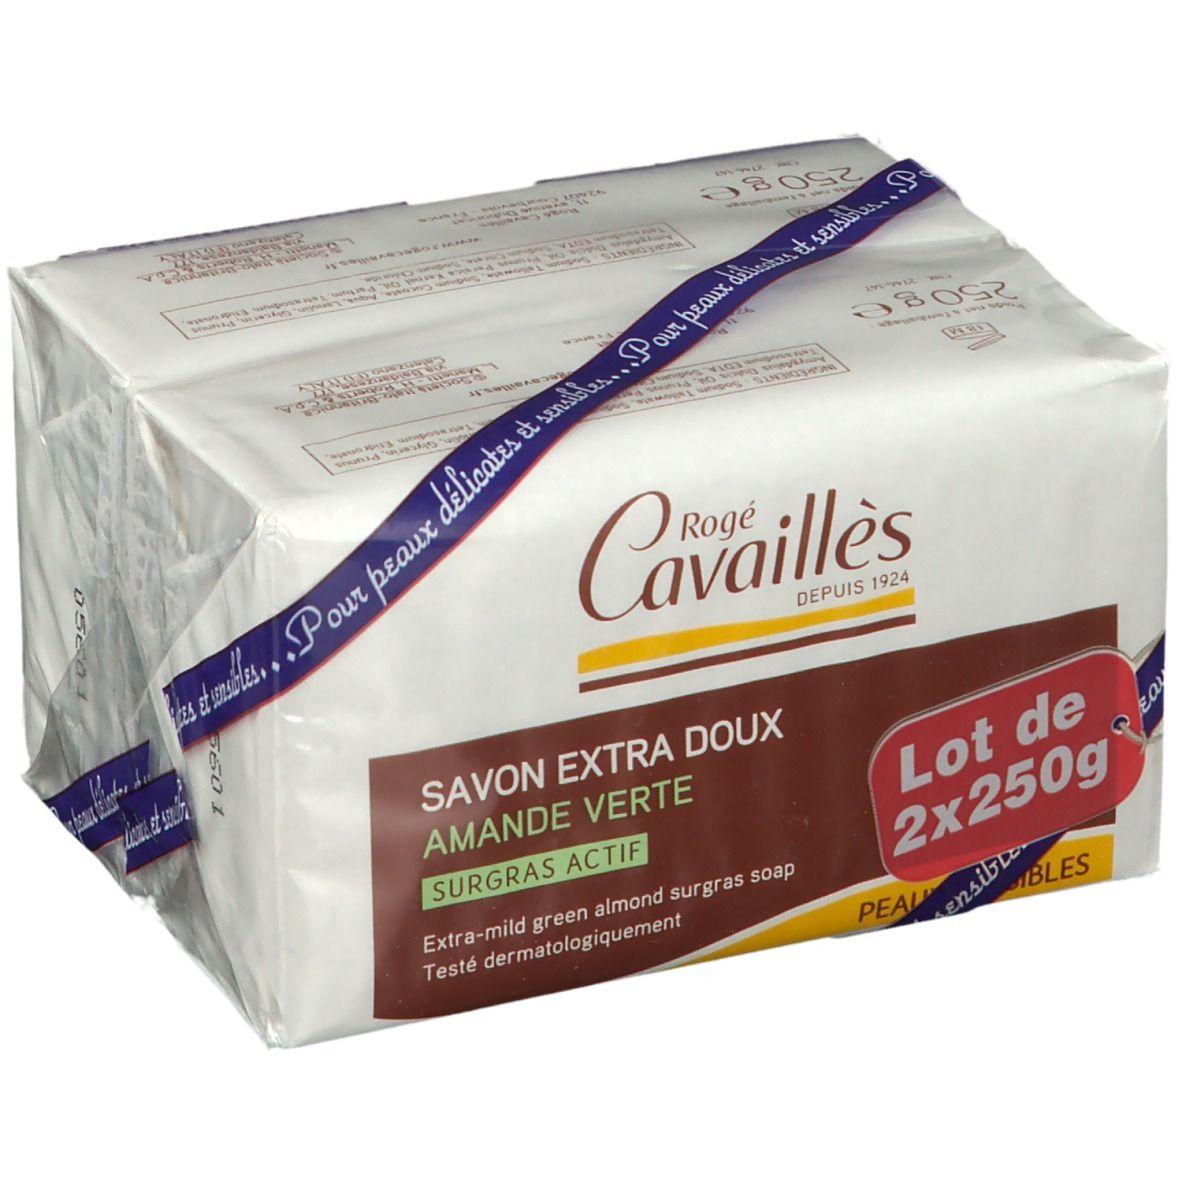 Rogé Cavaillès savon surgras amande verte g savon